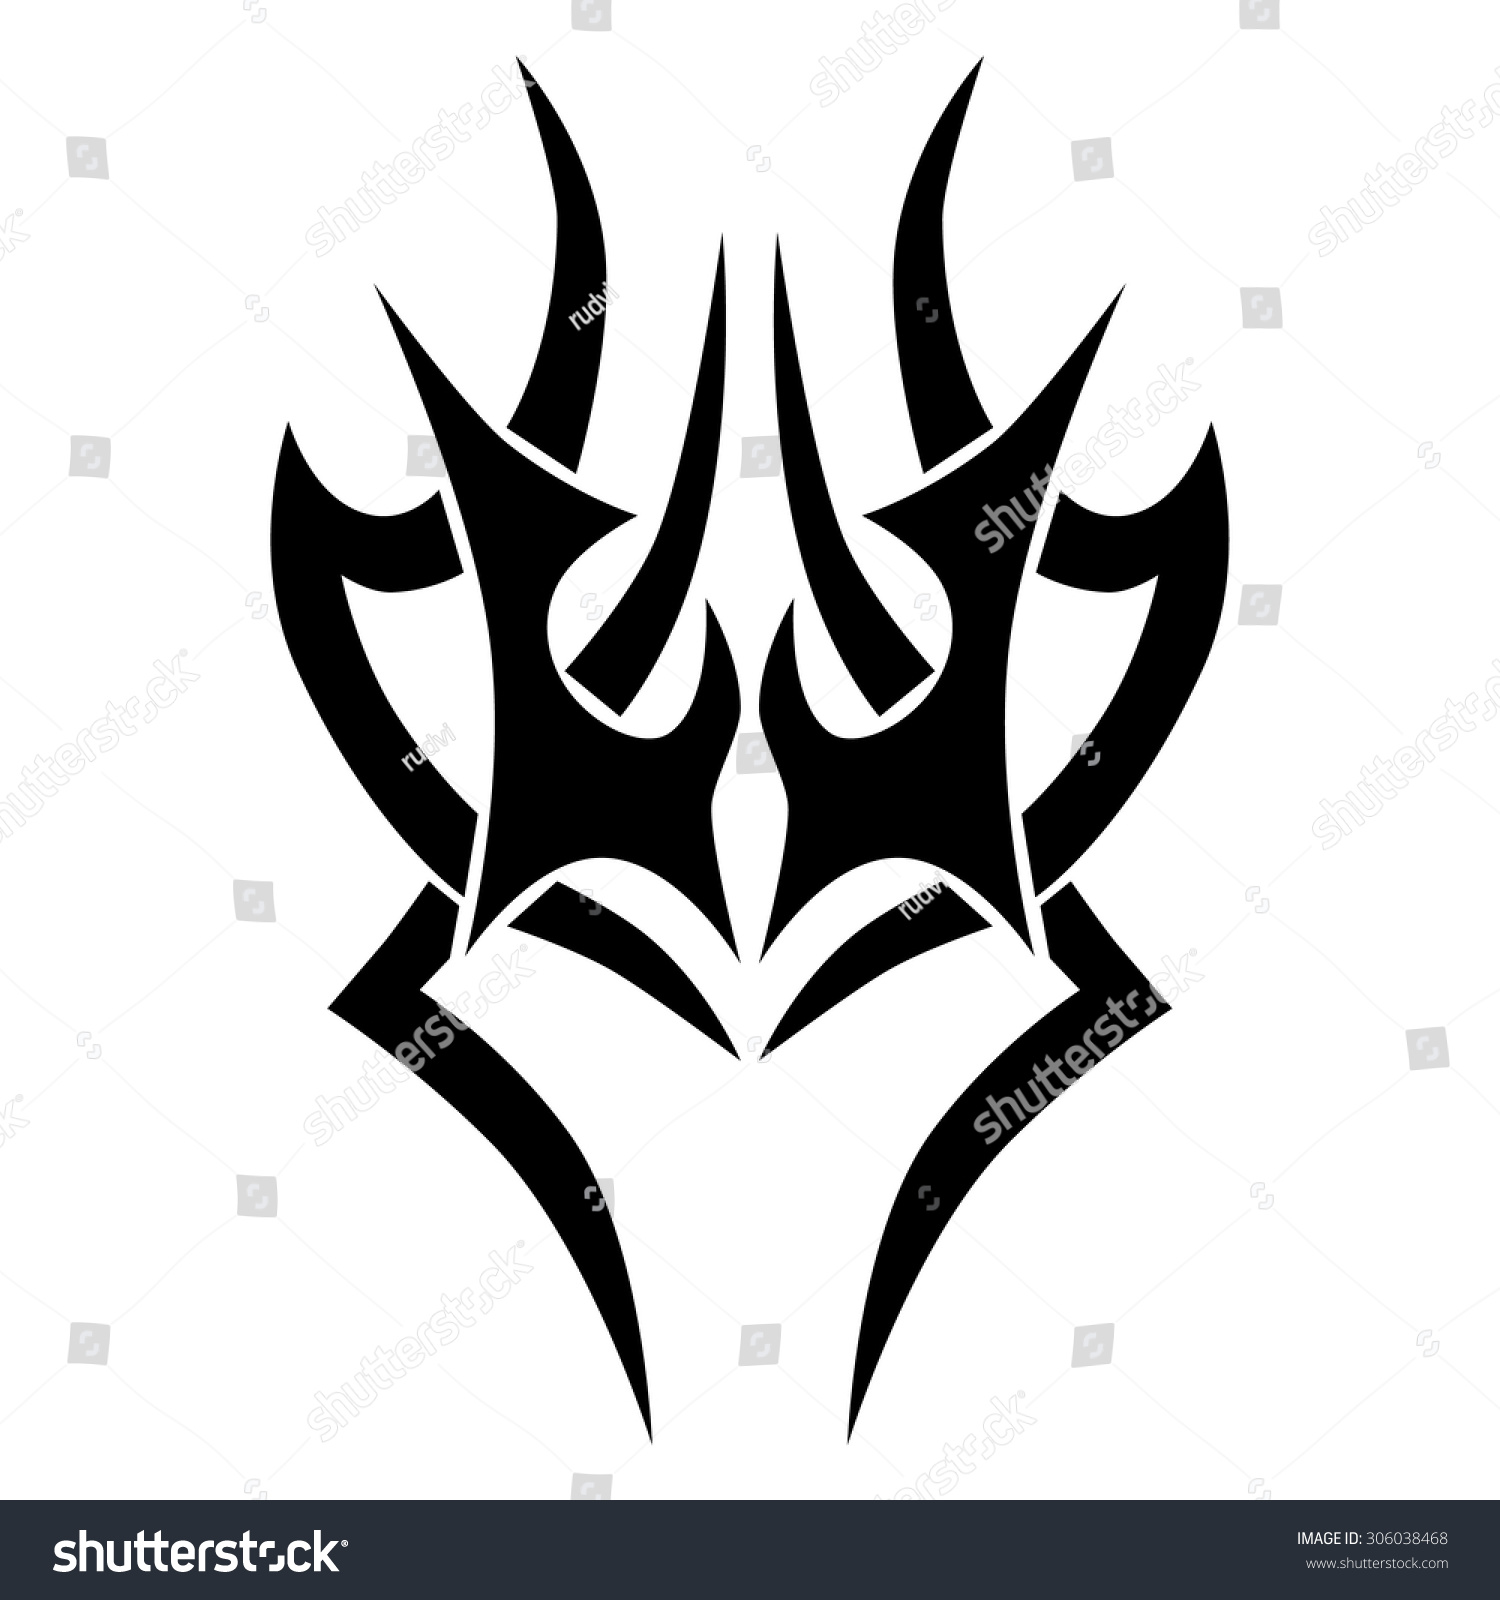 Tribal Designs Tribal Tattoos Art Tribal Stock Vector